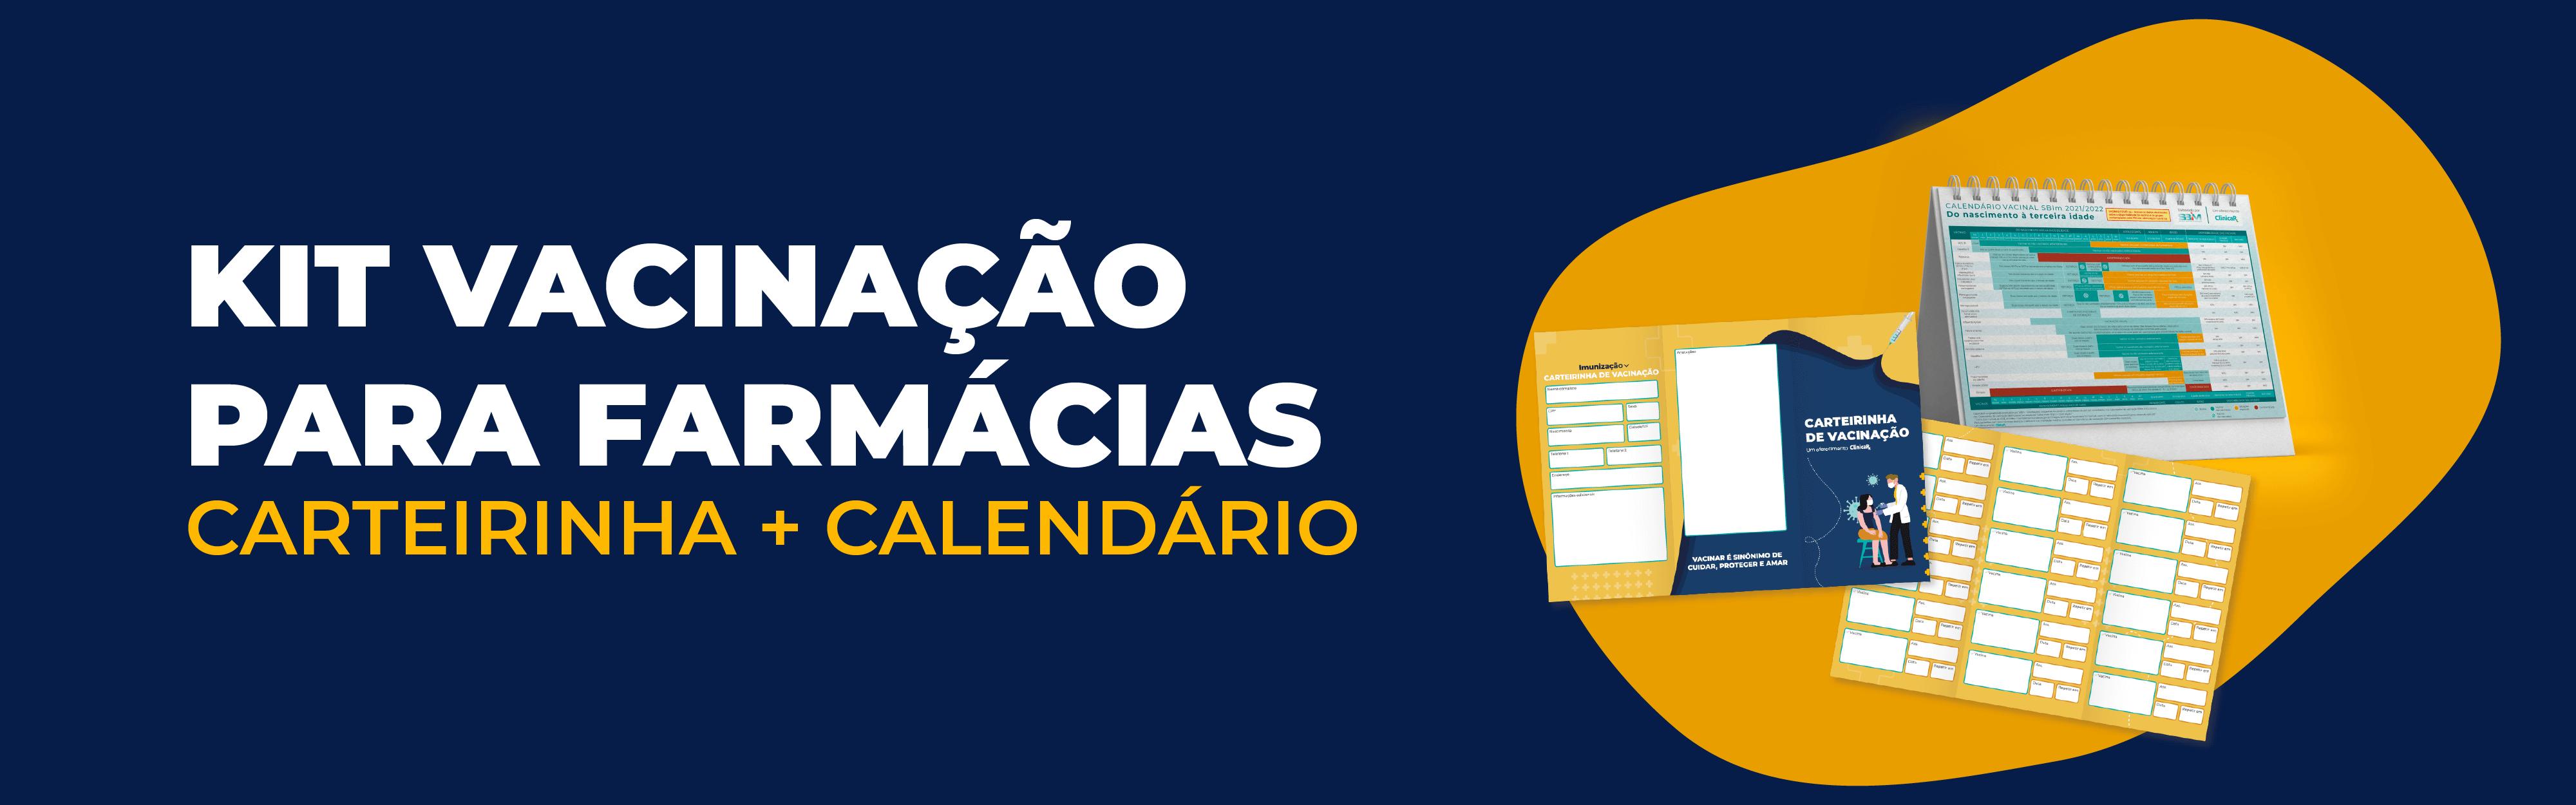 kit-vacinacao_topo